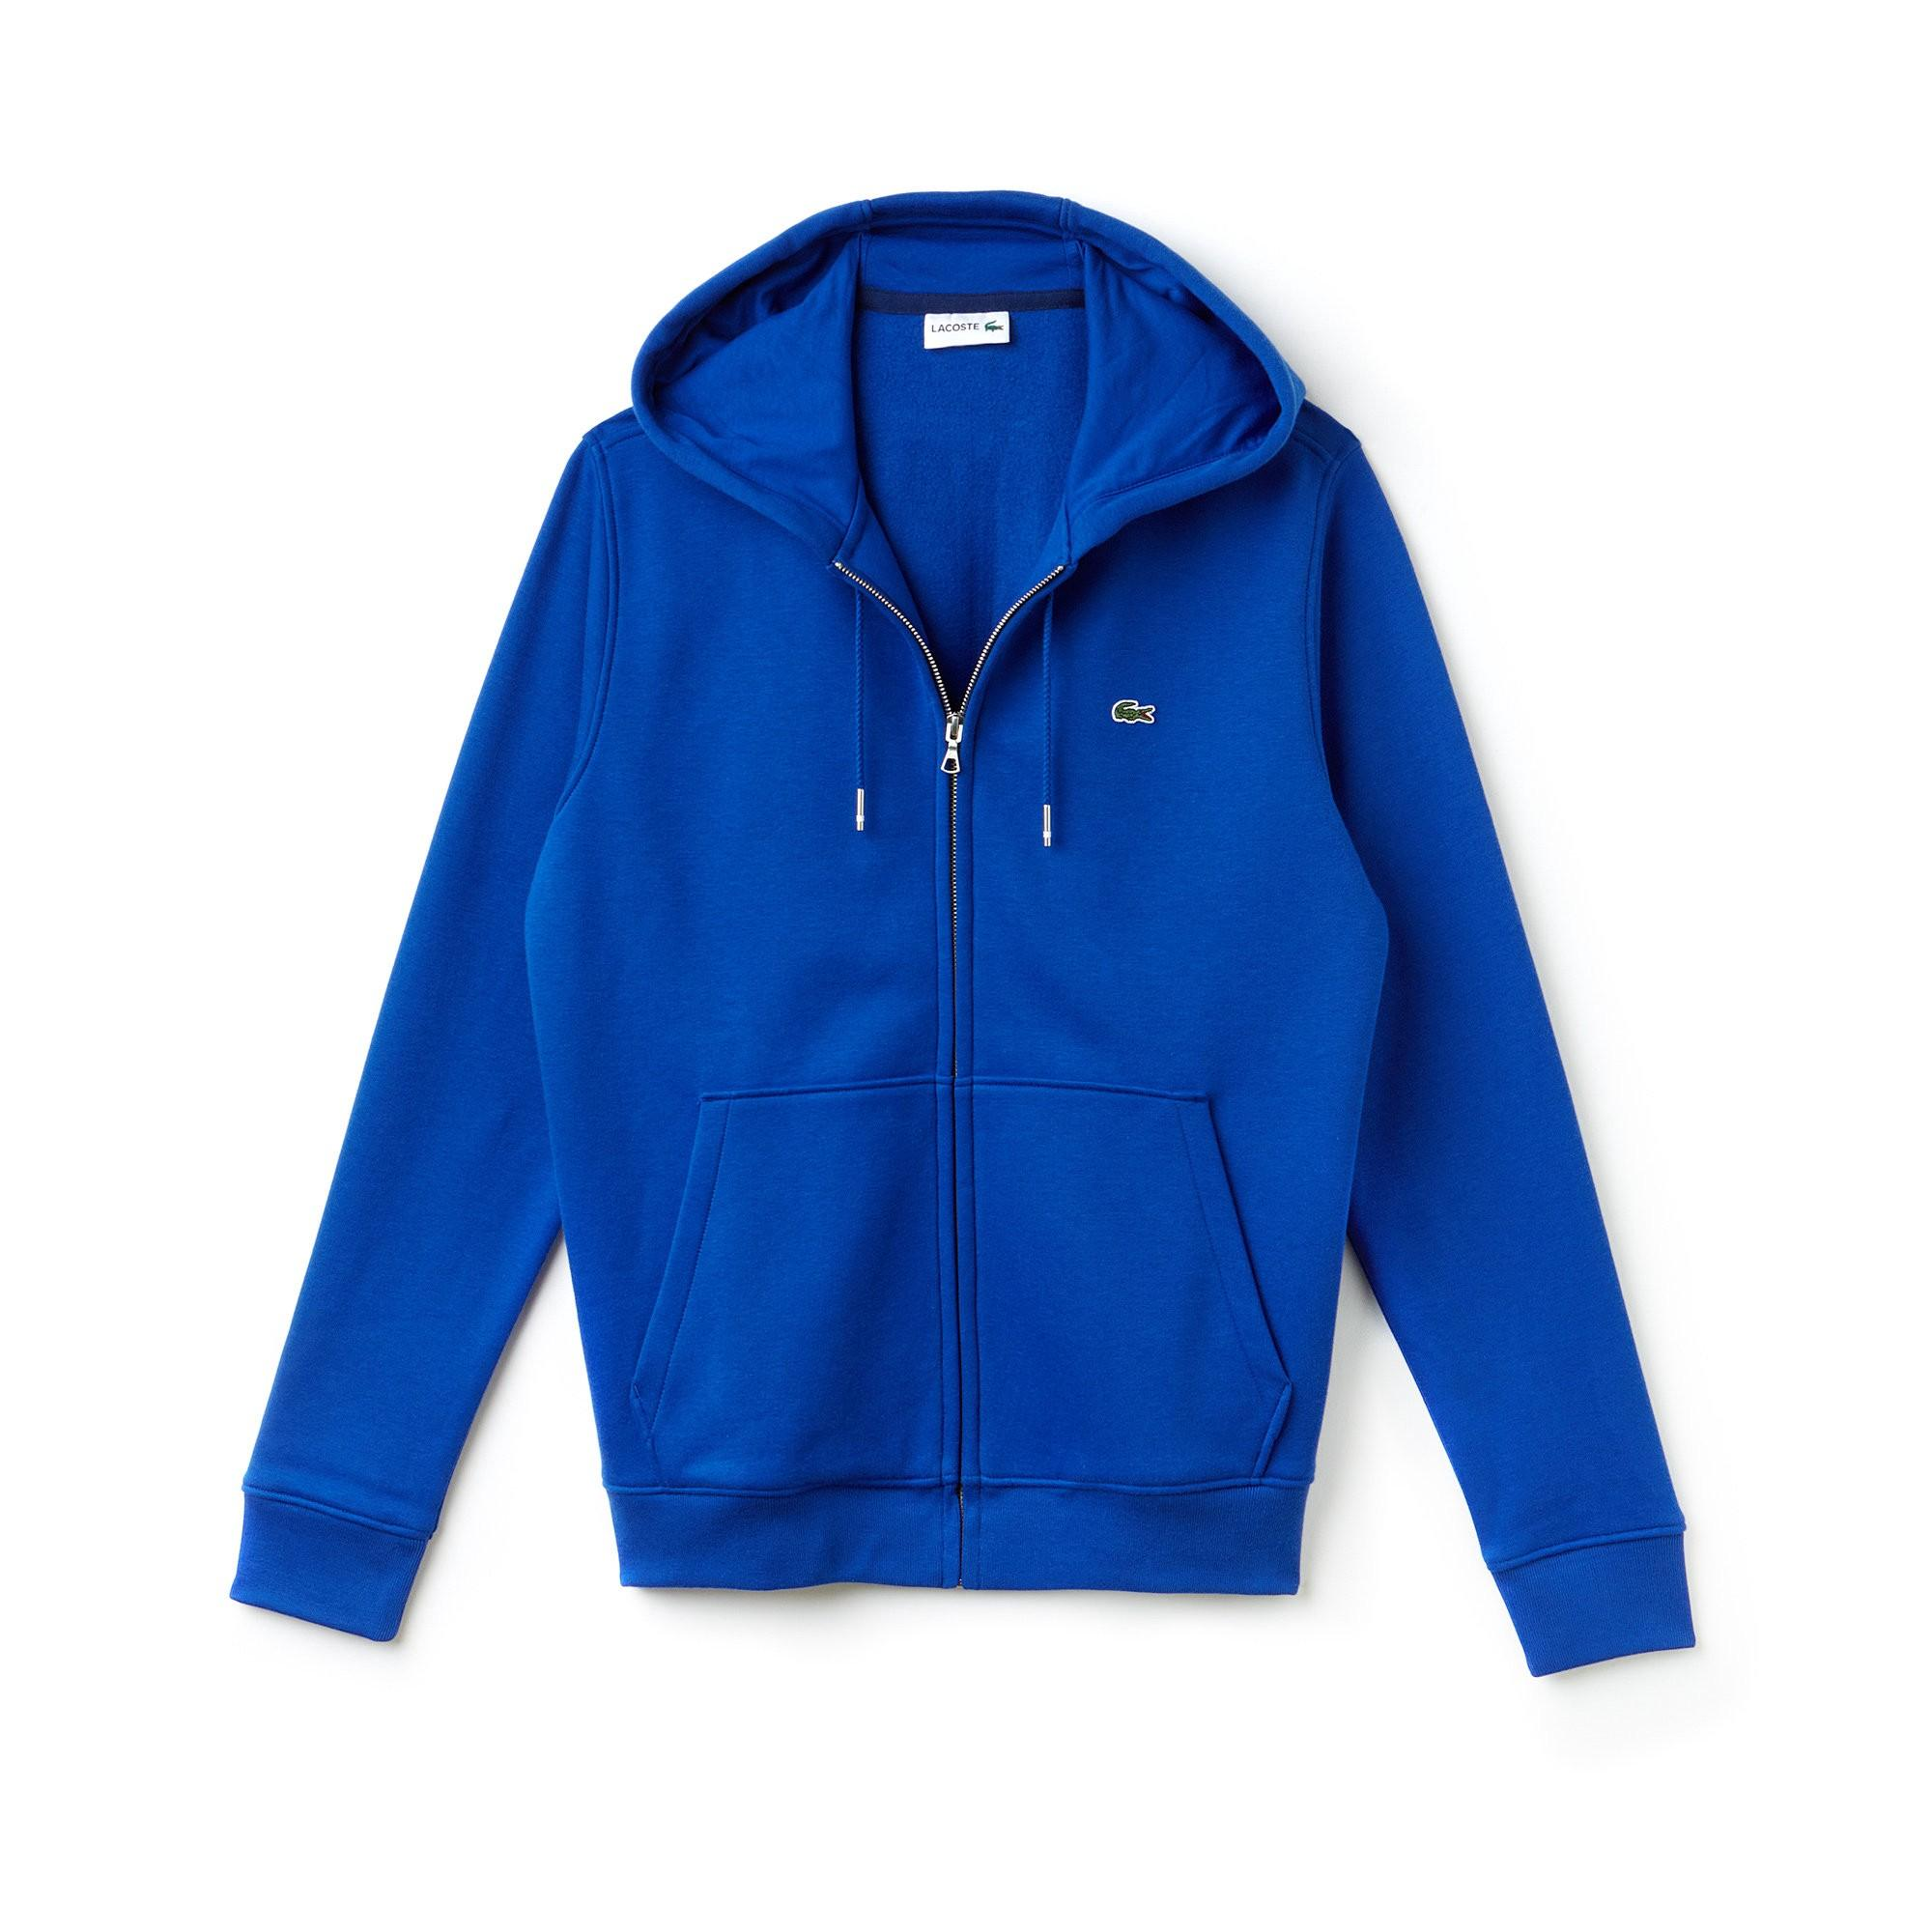 Zippered Hooded Fleece Brushed Men's Steamermethylene Sweatshirt TJ3FKcl1